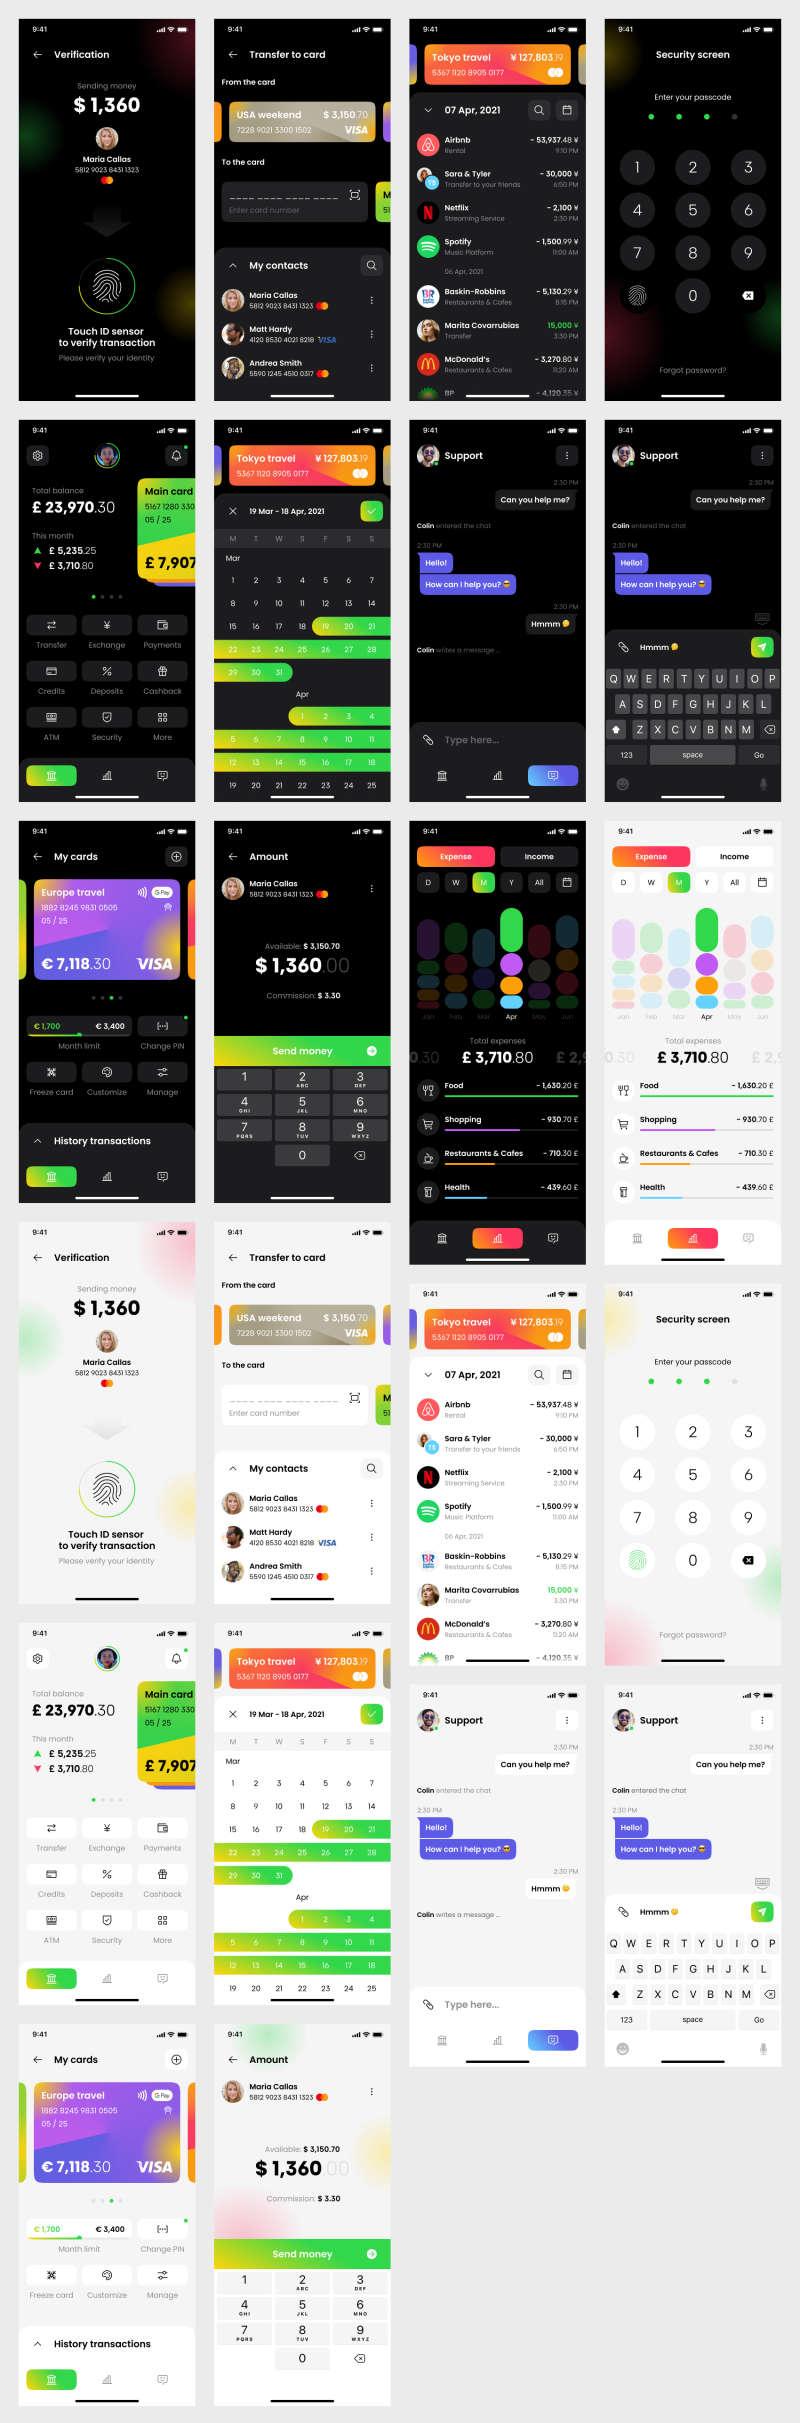 Banking App Free UI Kit for Figma